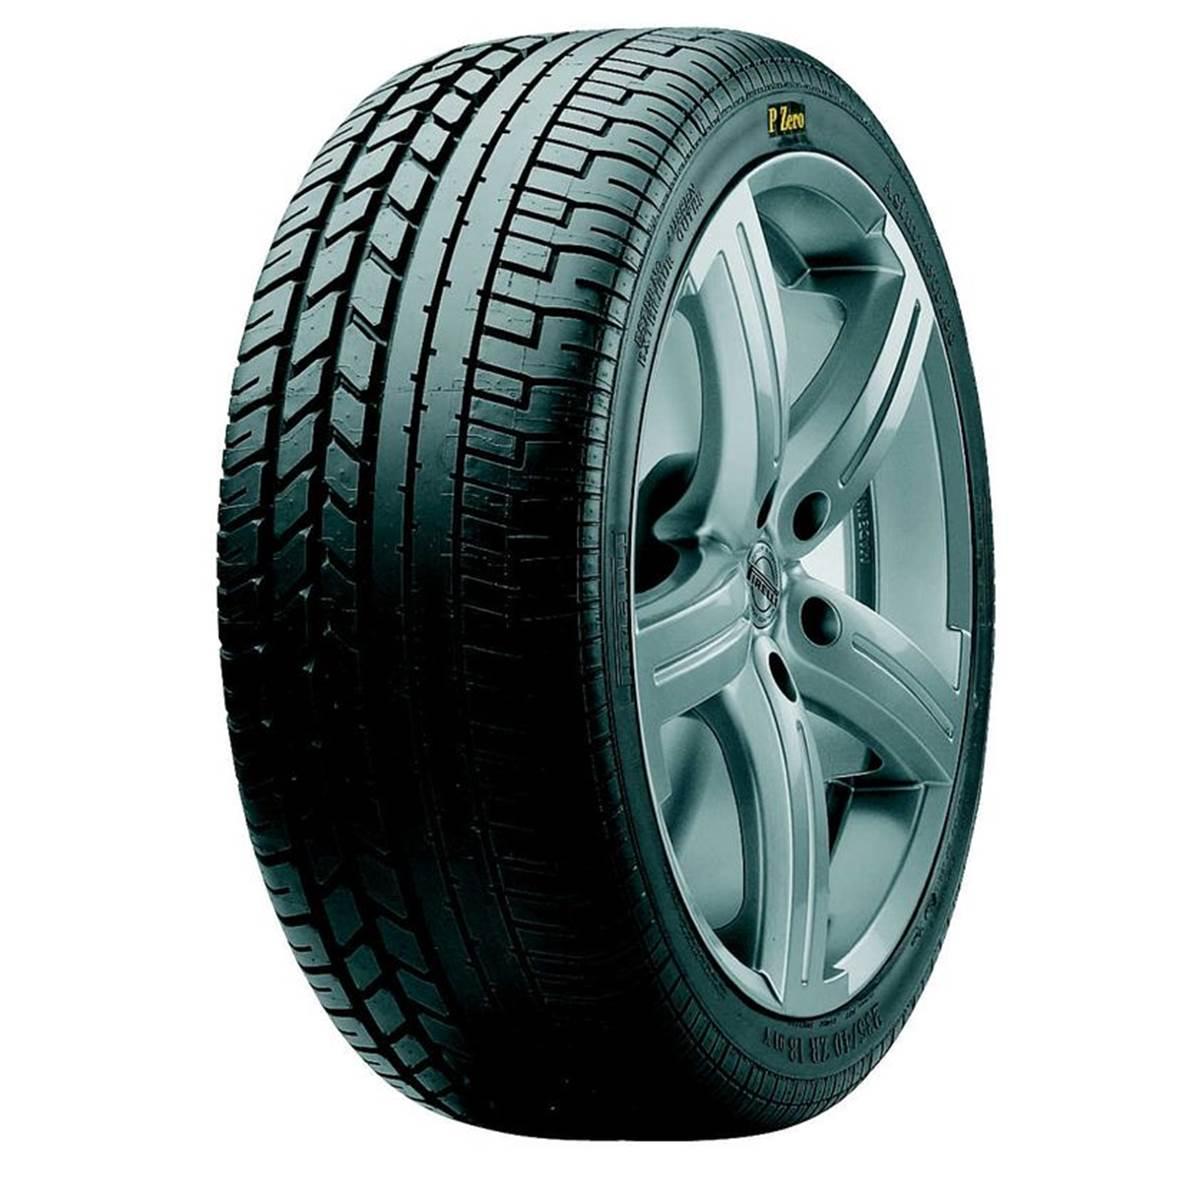 Pneu Pirelli 225/50R16 92Y Pzero Asimmetrico